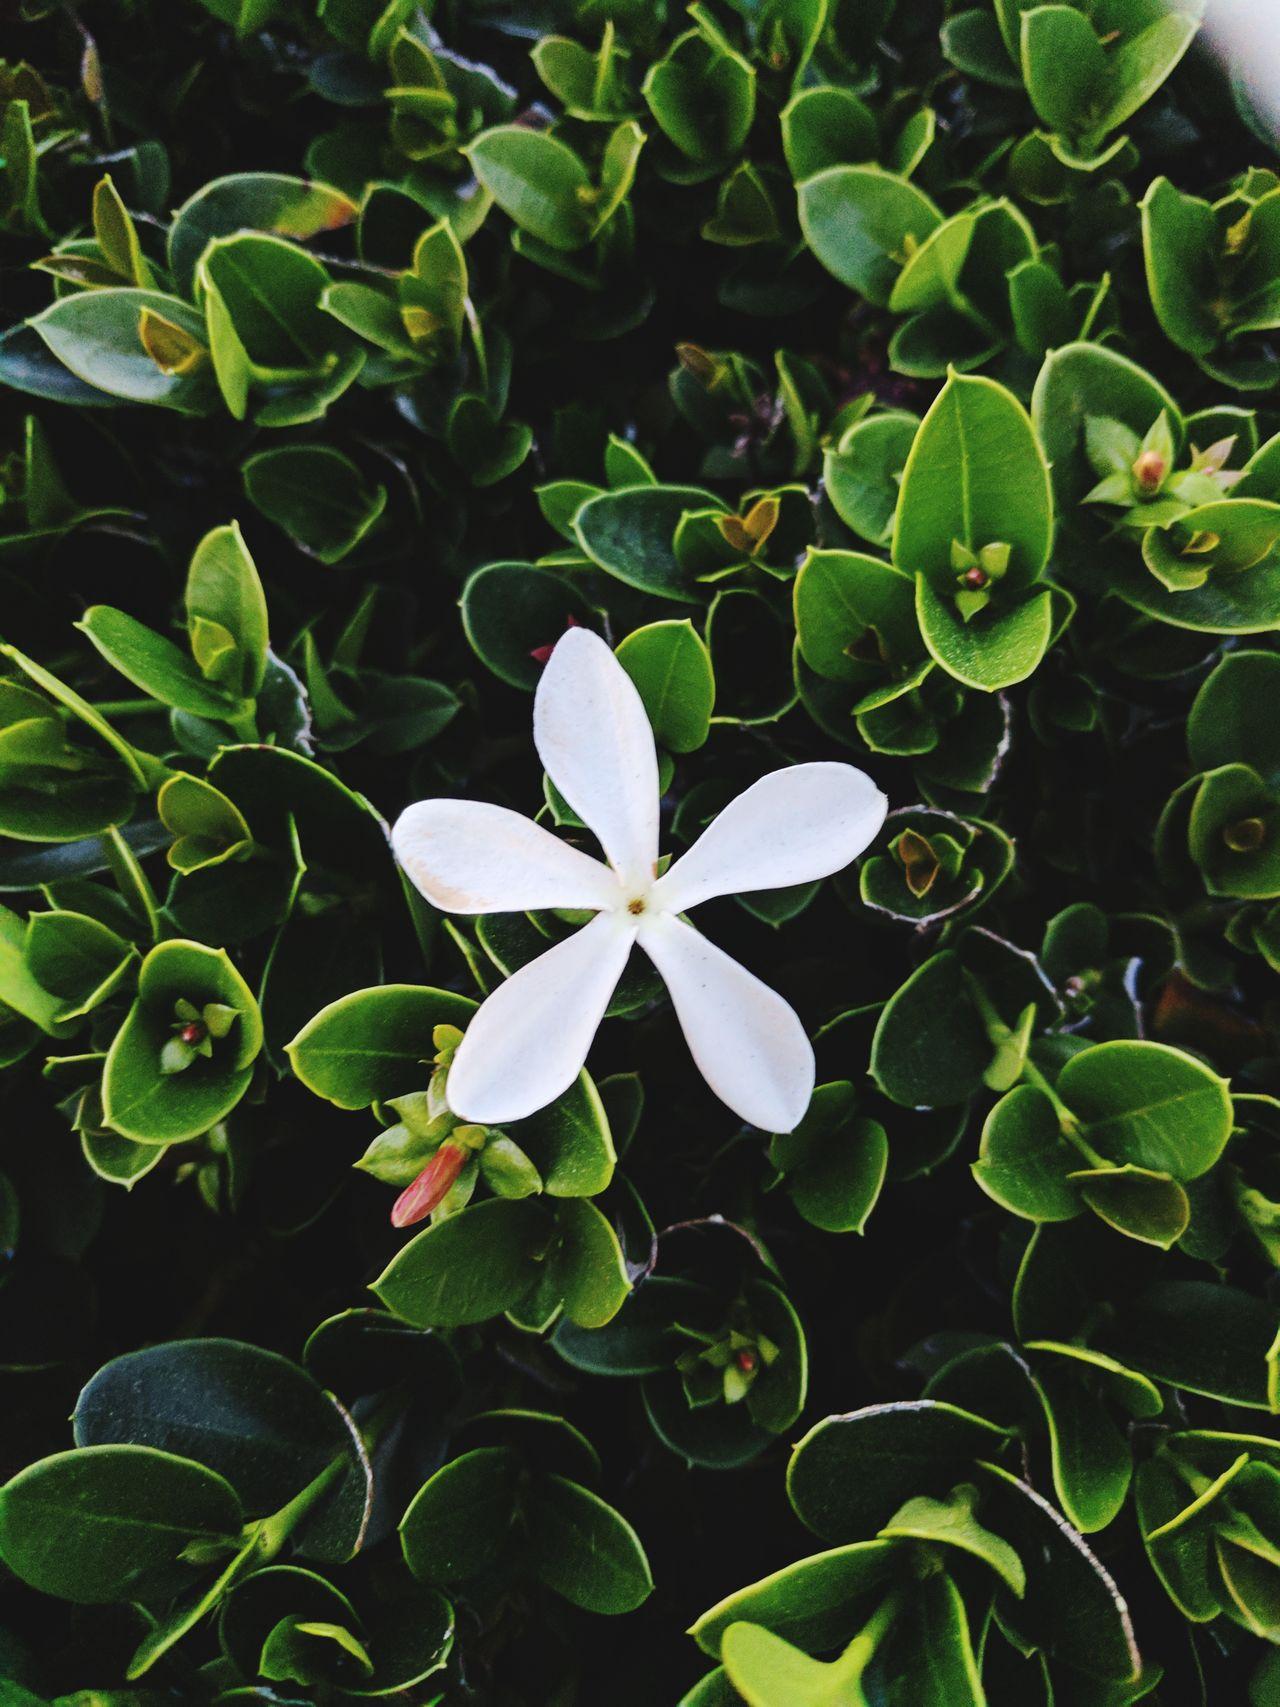 First Eyeem Photo Flower Head Flowerporn Botanical EyeEm Nature Lover EyeEmFlower Botany